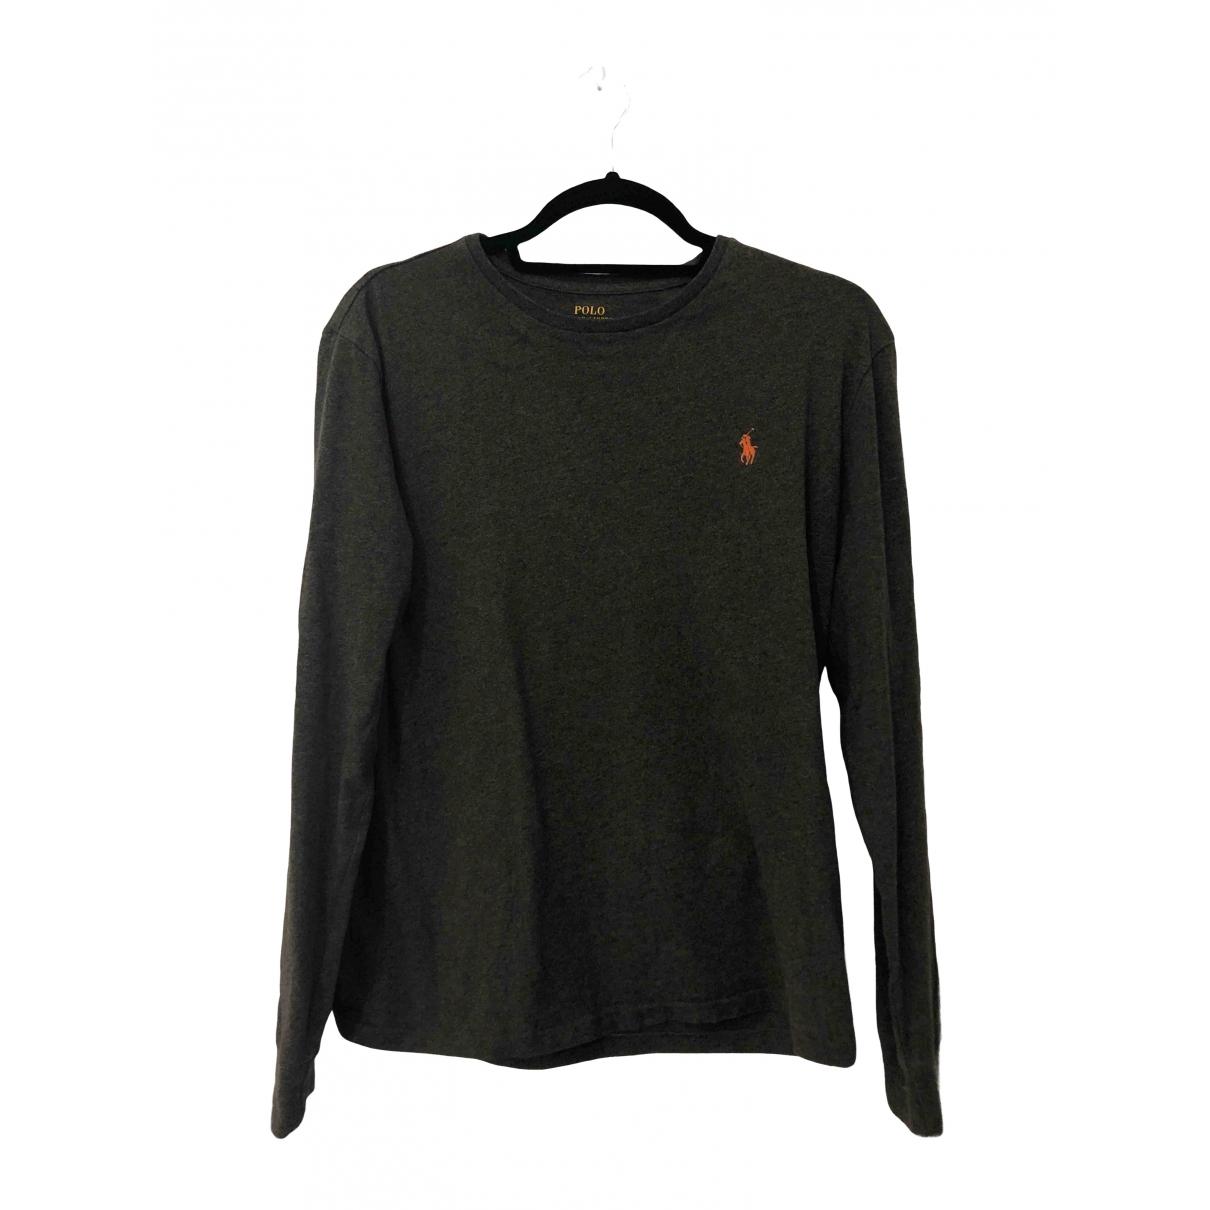 Polo Ralph Lauren - Tee shirts   pour homme en coton - vert